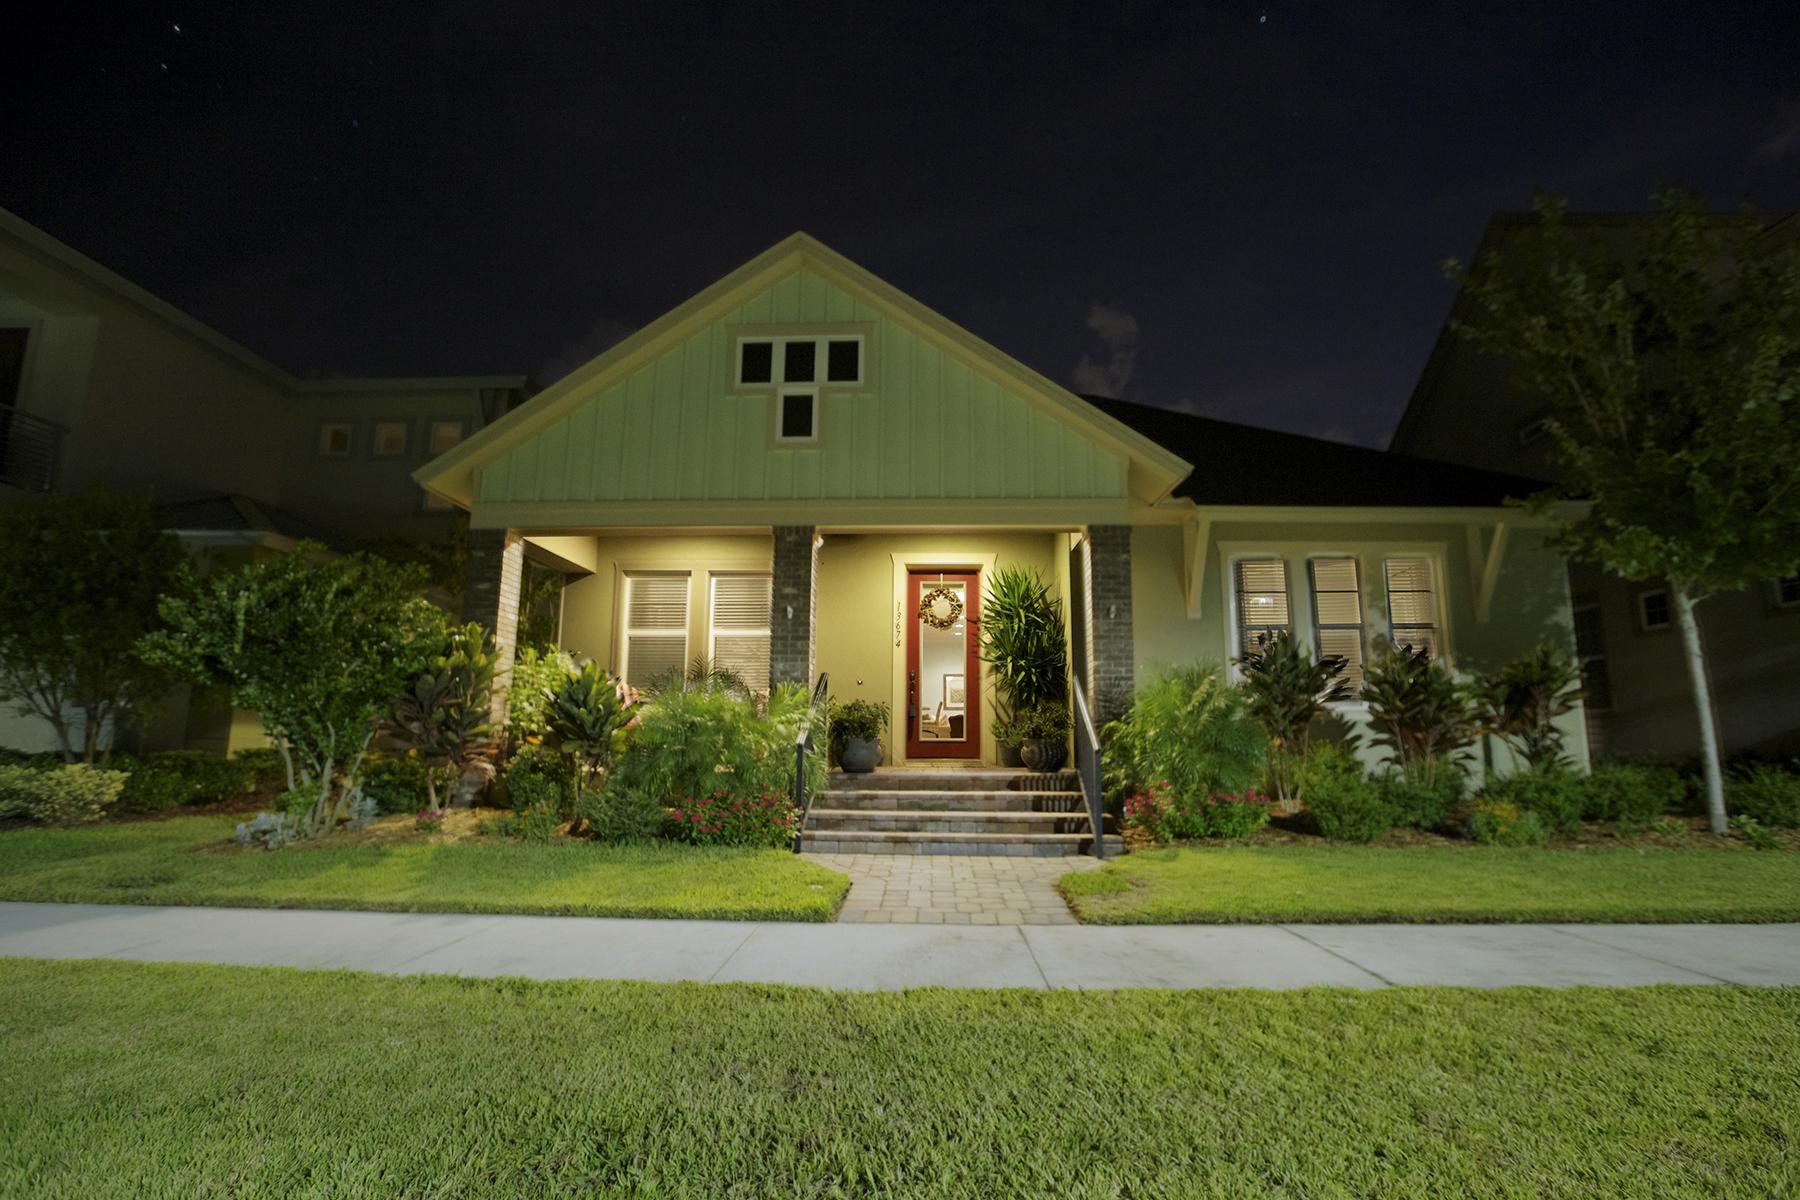 Single Family Home for Sale at LAKE NONA 13674 Briand Ave Orlando, Florida, 32827 United States